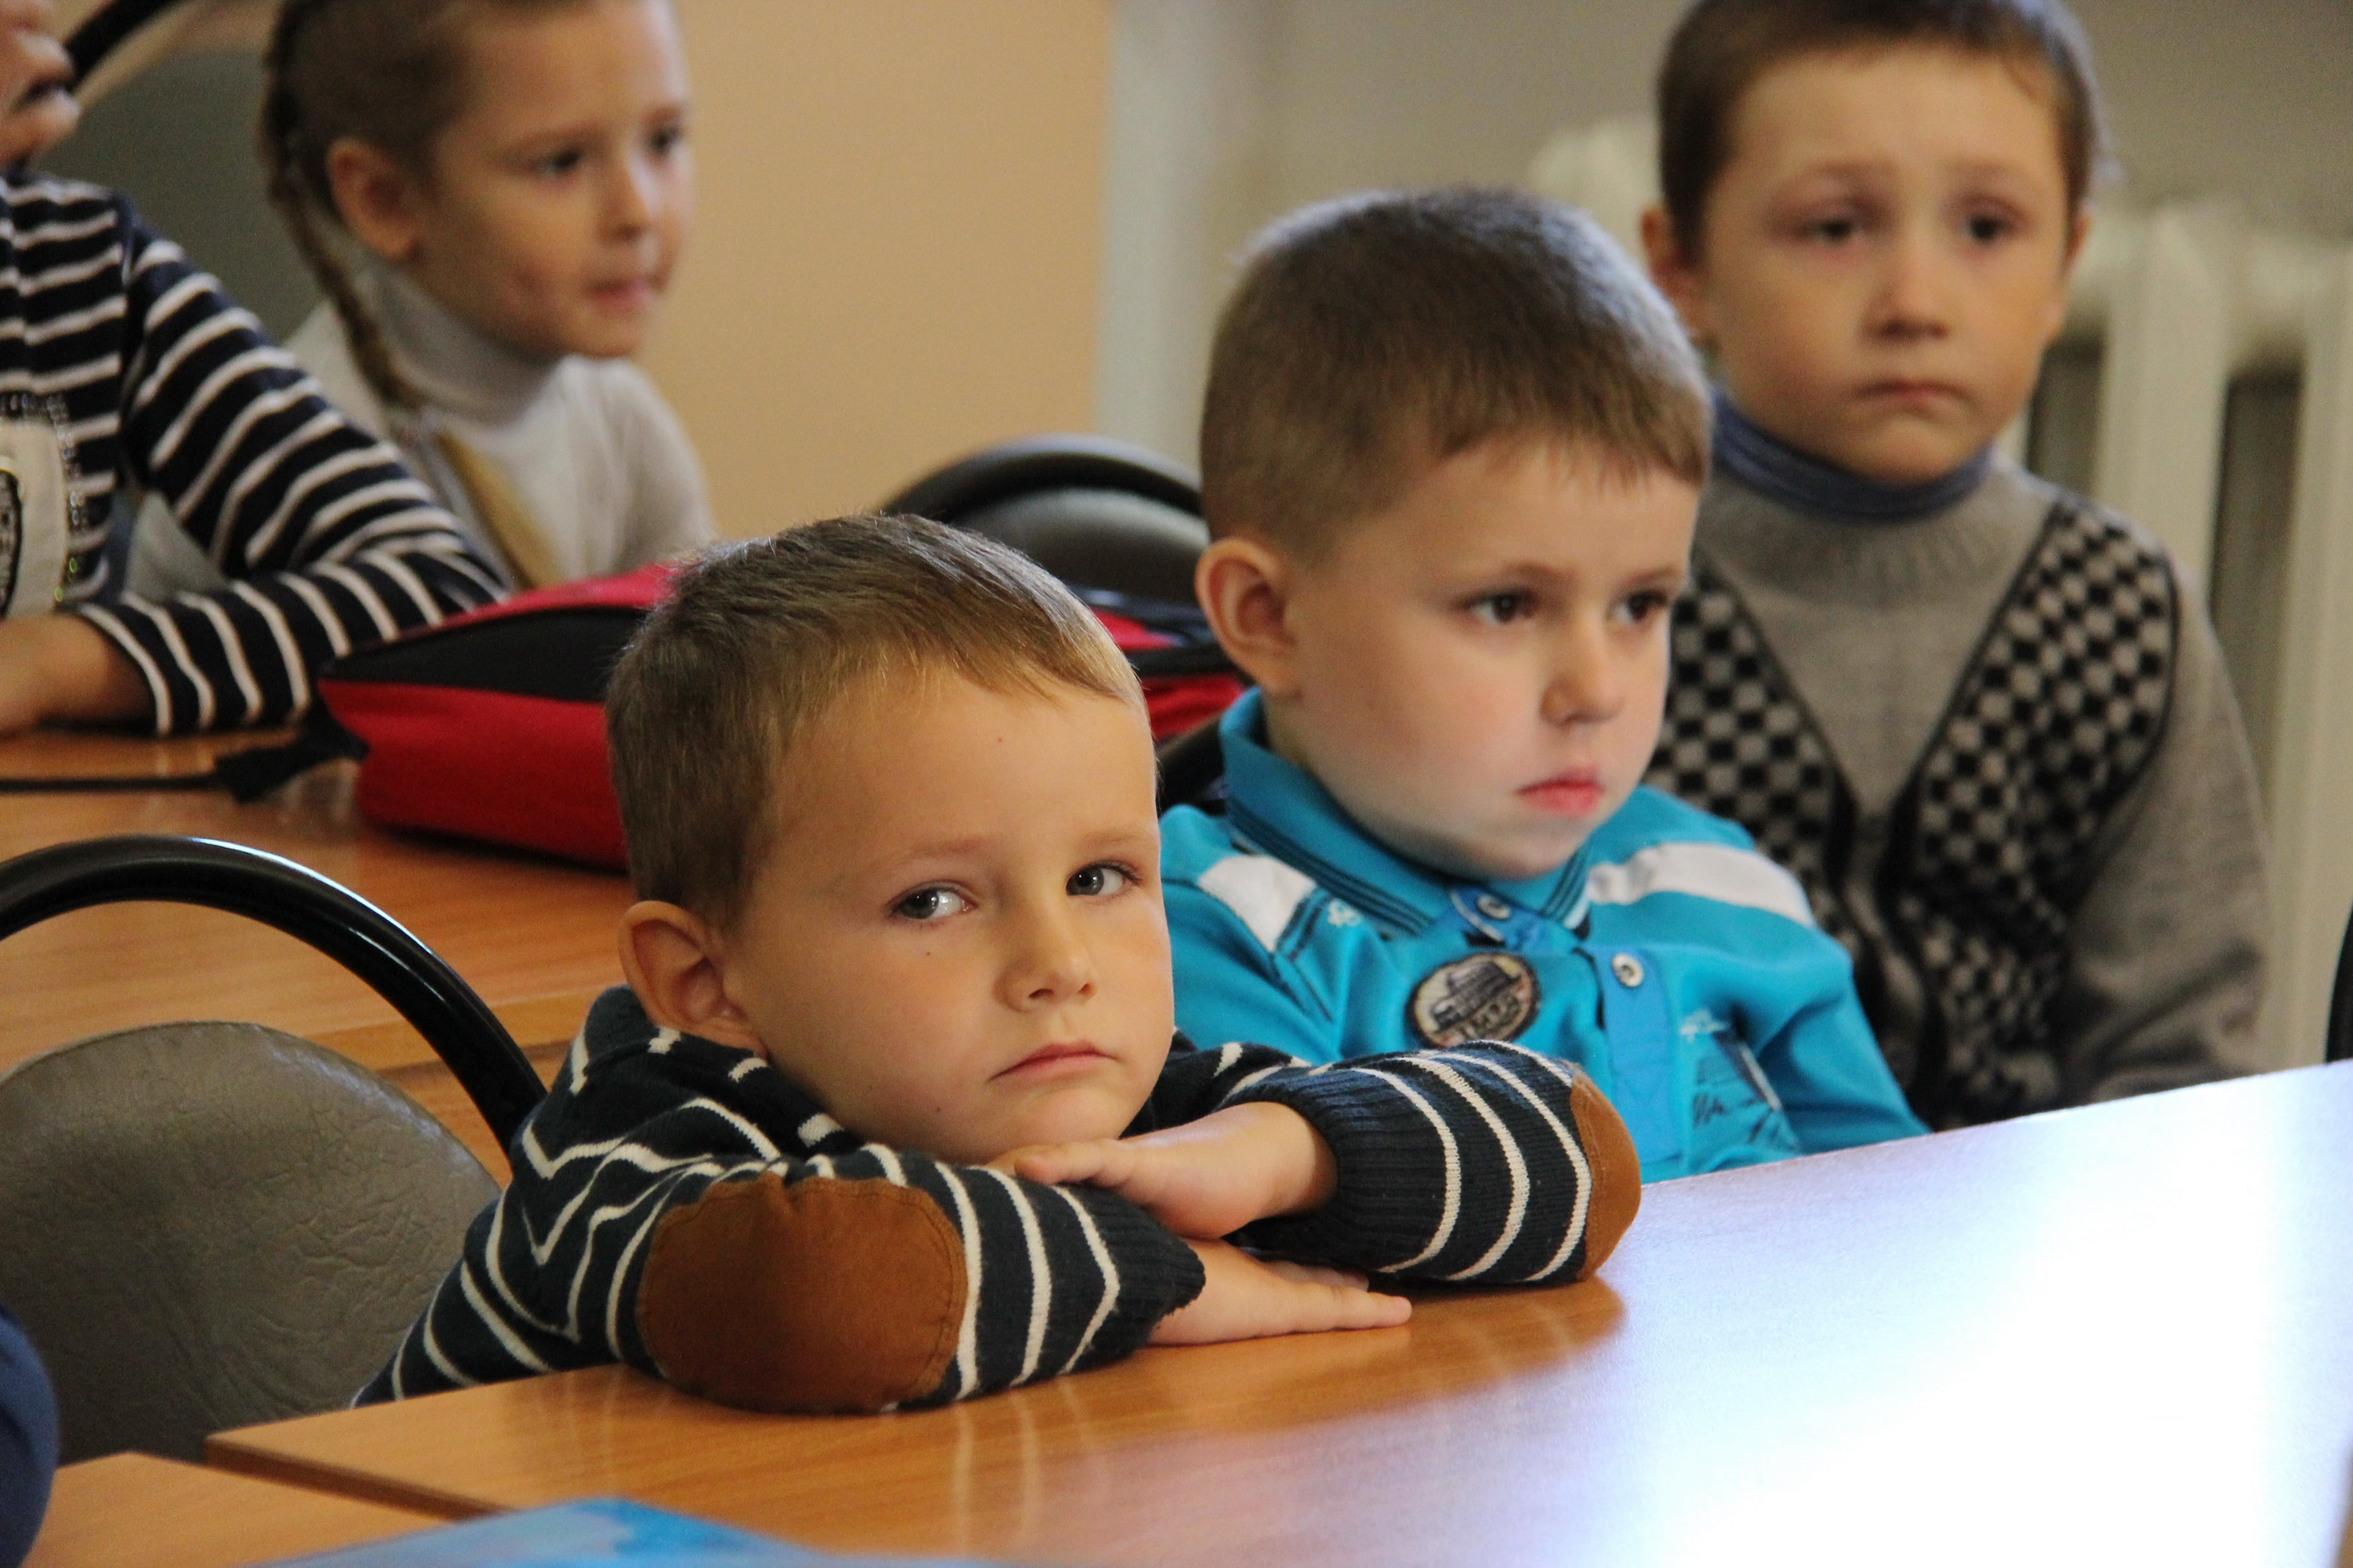 http://monuspen.ru/photoreports/88c681a8ee7fcb437fe27af18a17a71j.JPG